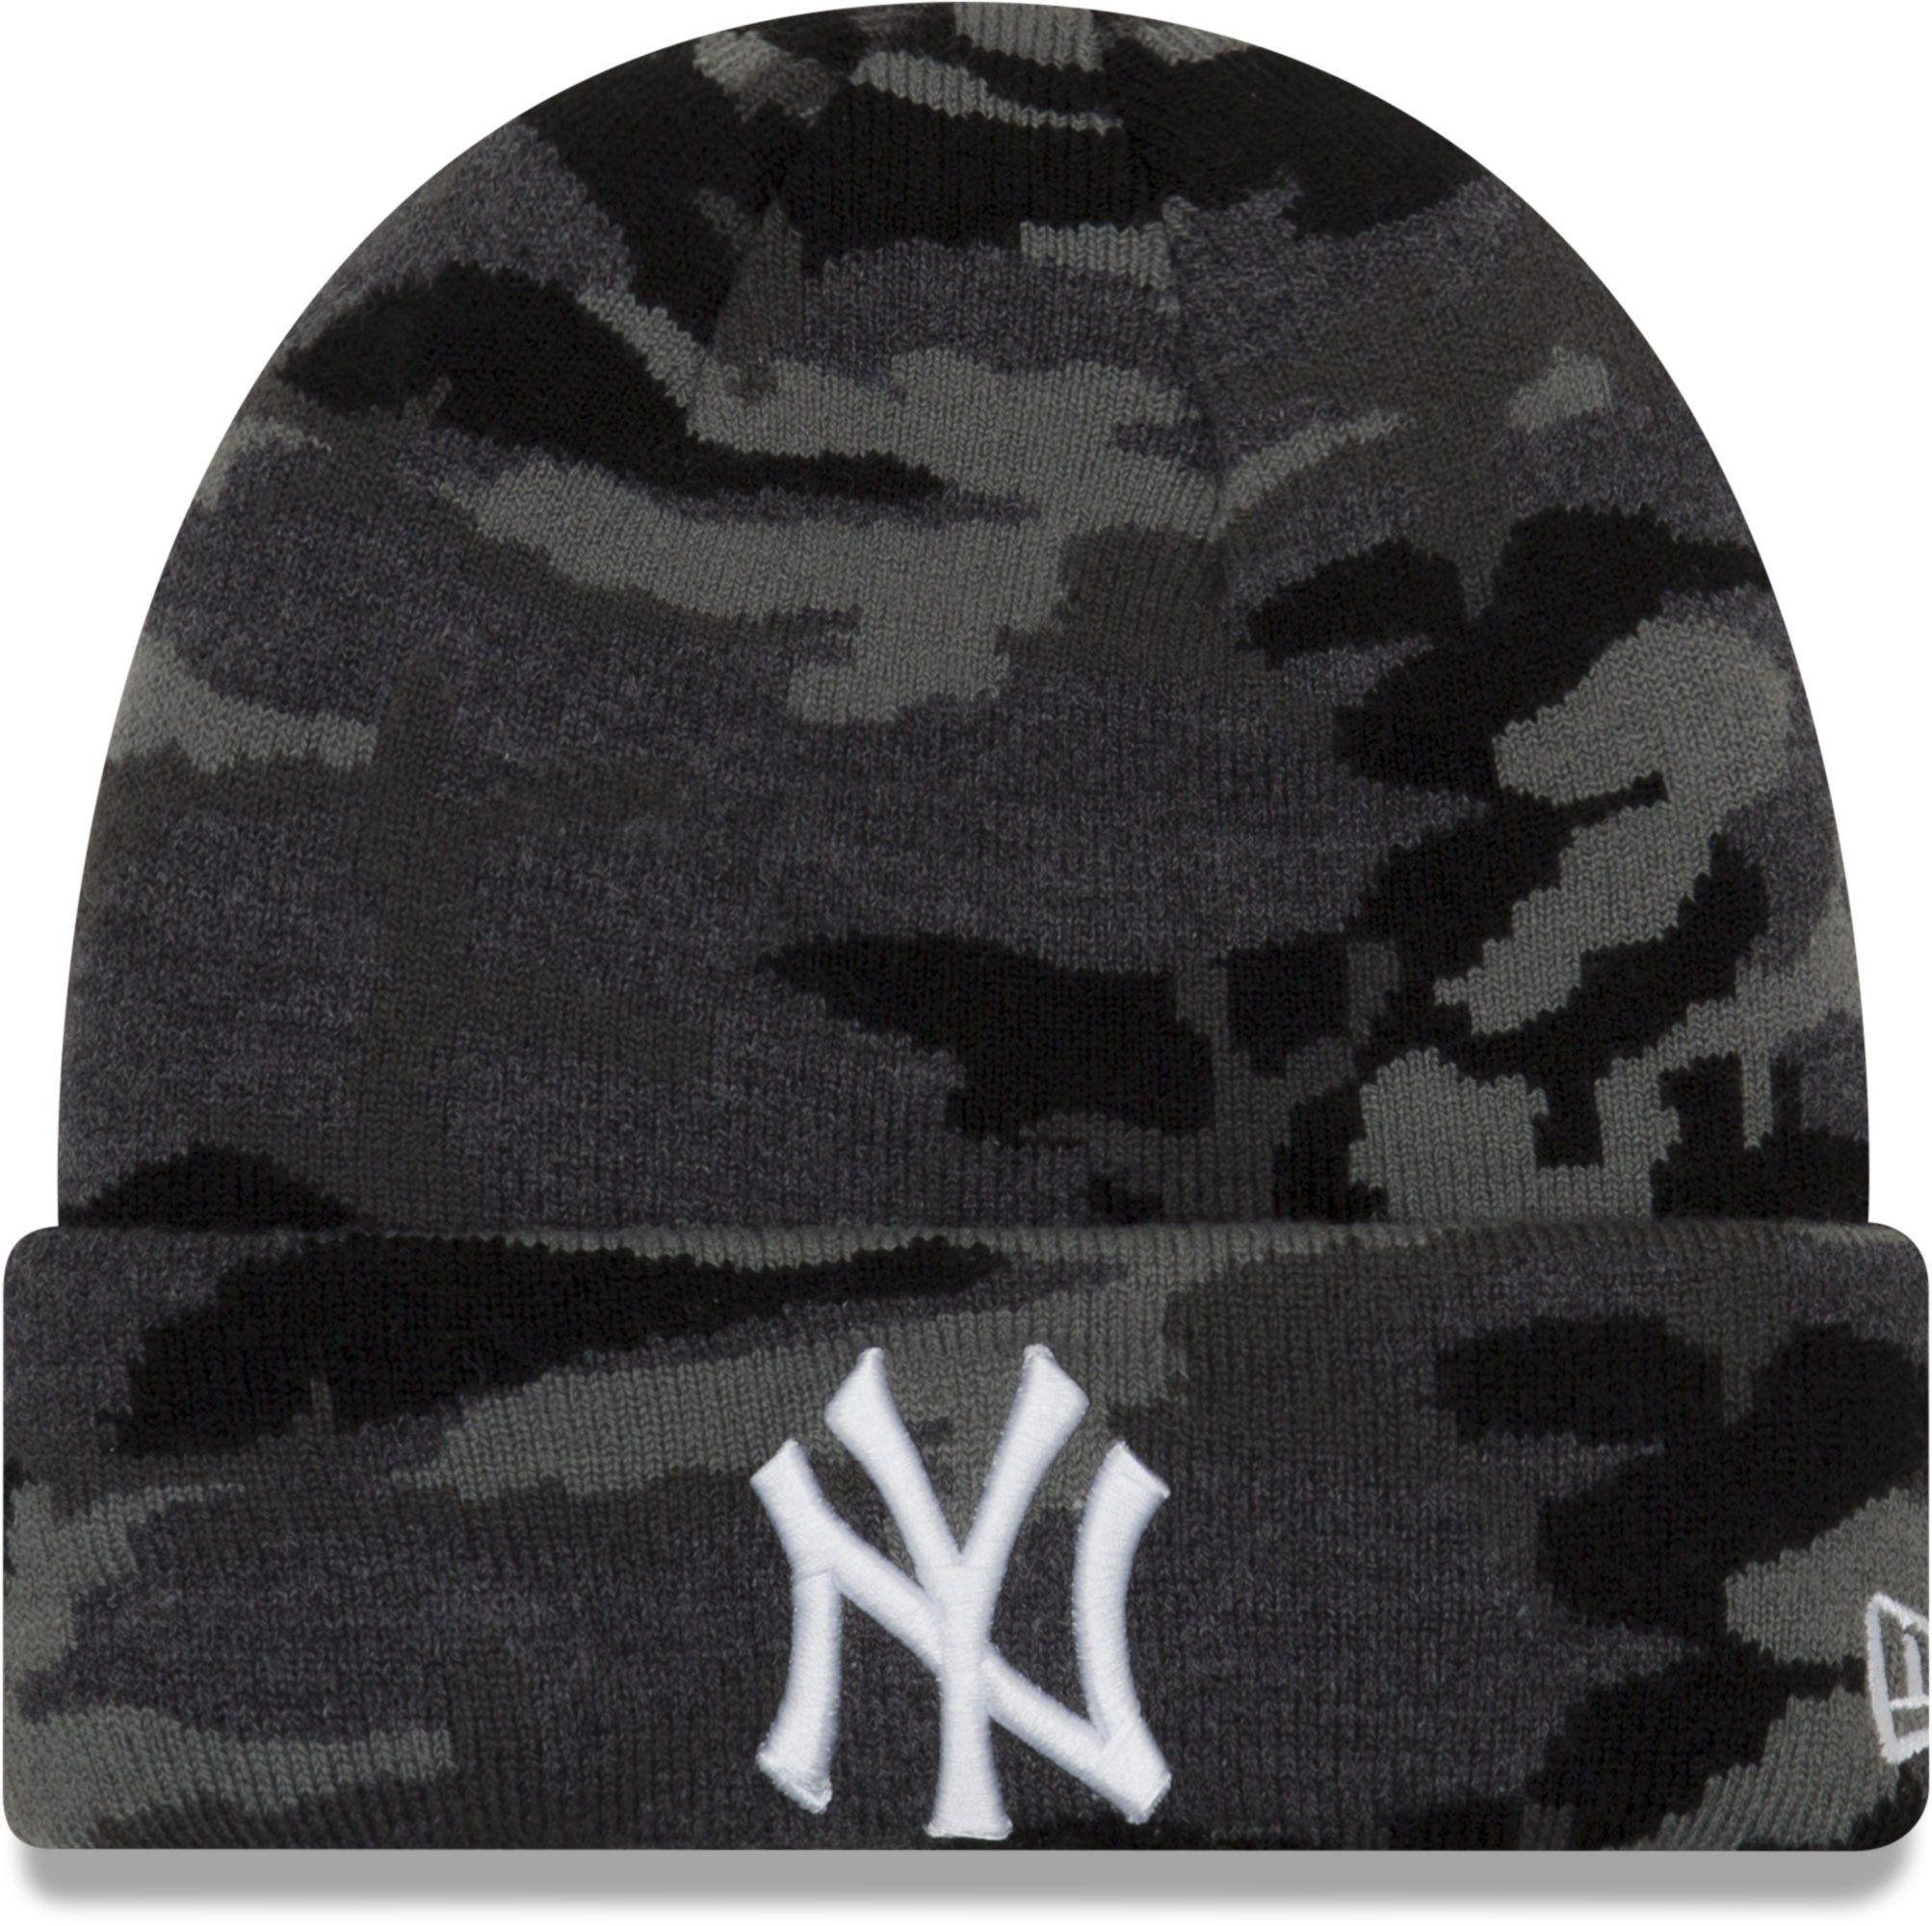 the best attitude 785a3 13a55 New York Yankees New Era Essential Midnight Camo Knit Beanie – lovemycap